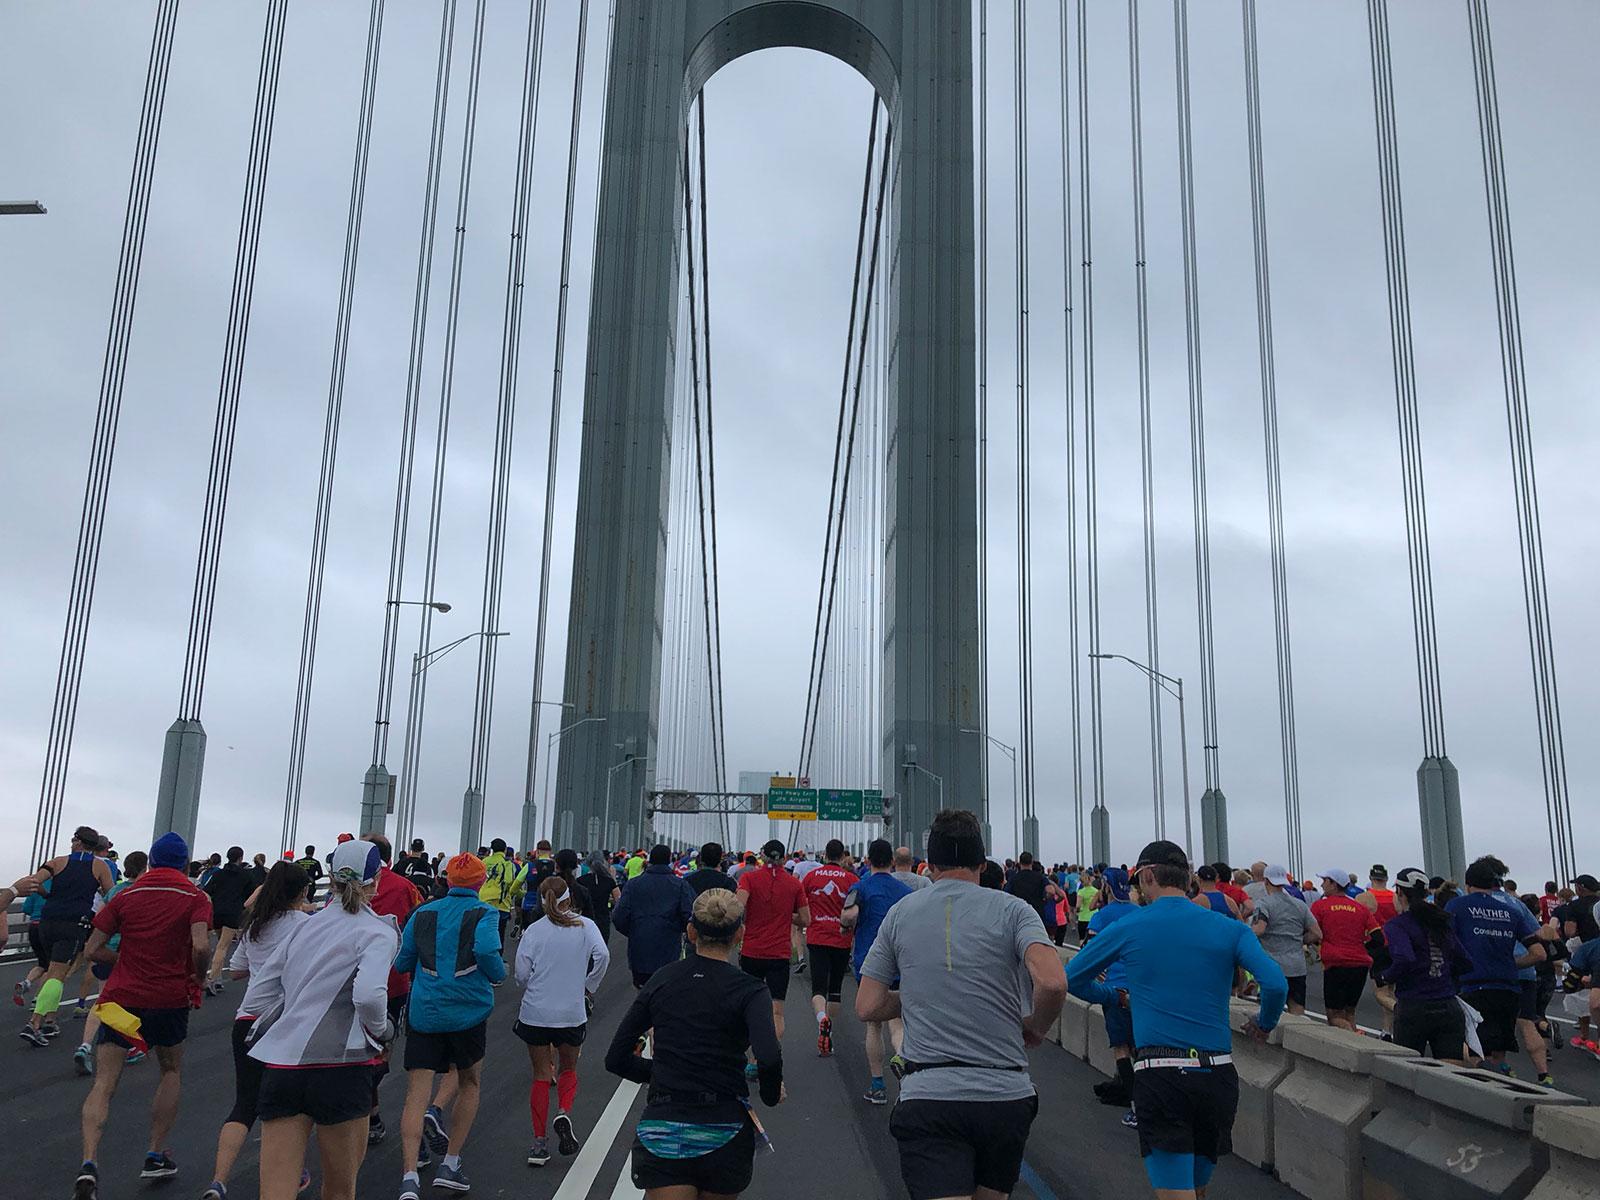 NYC Marathon experience